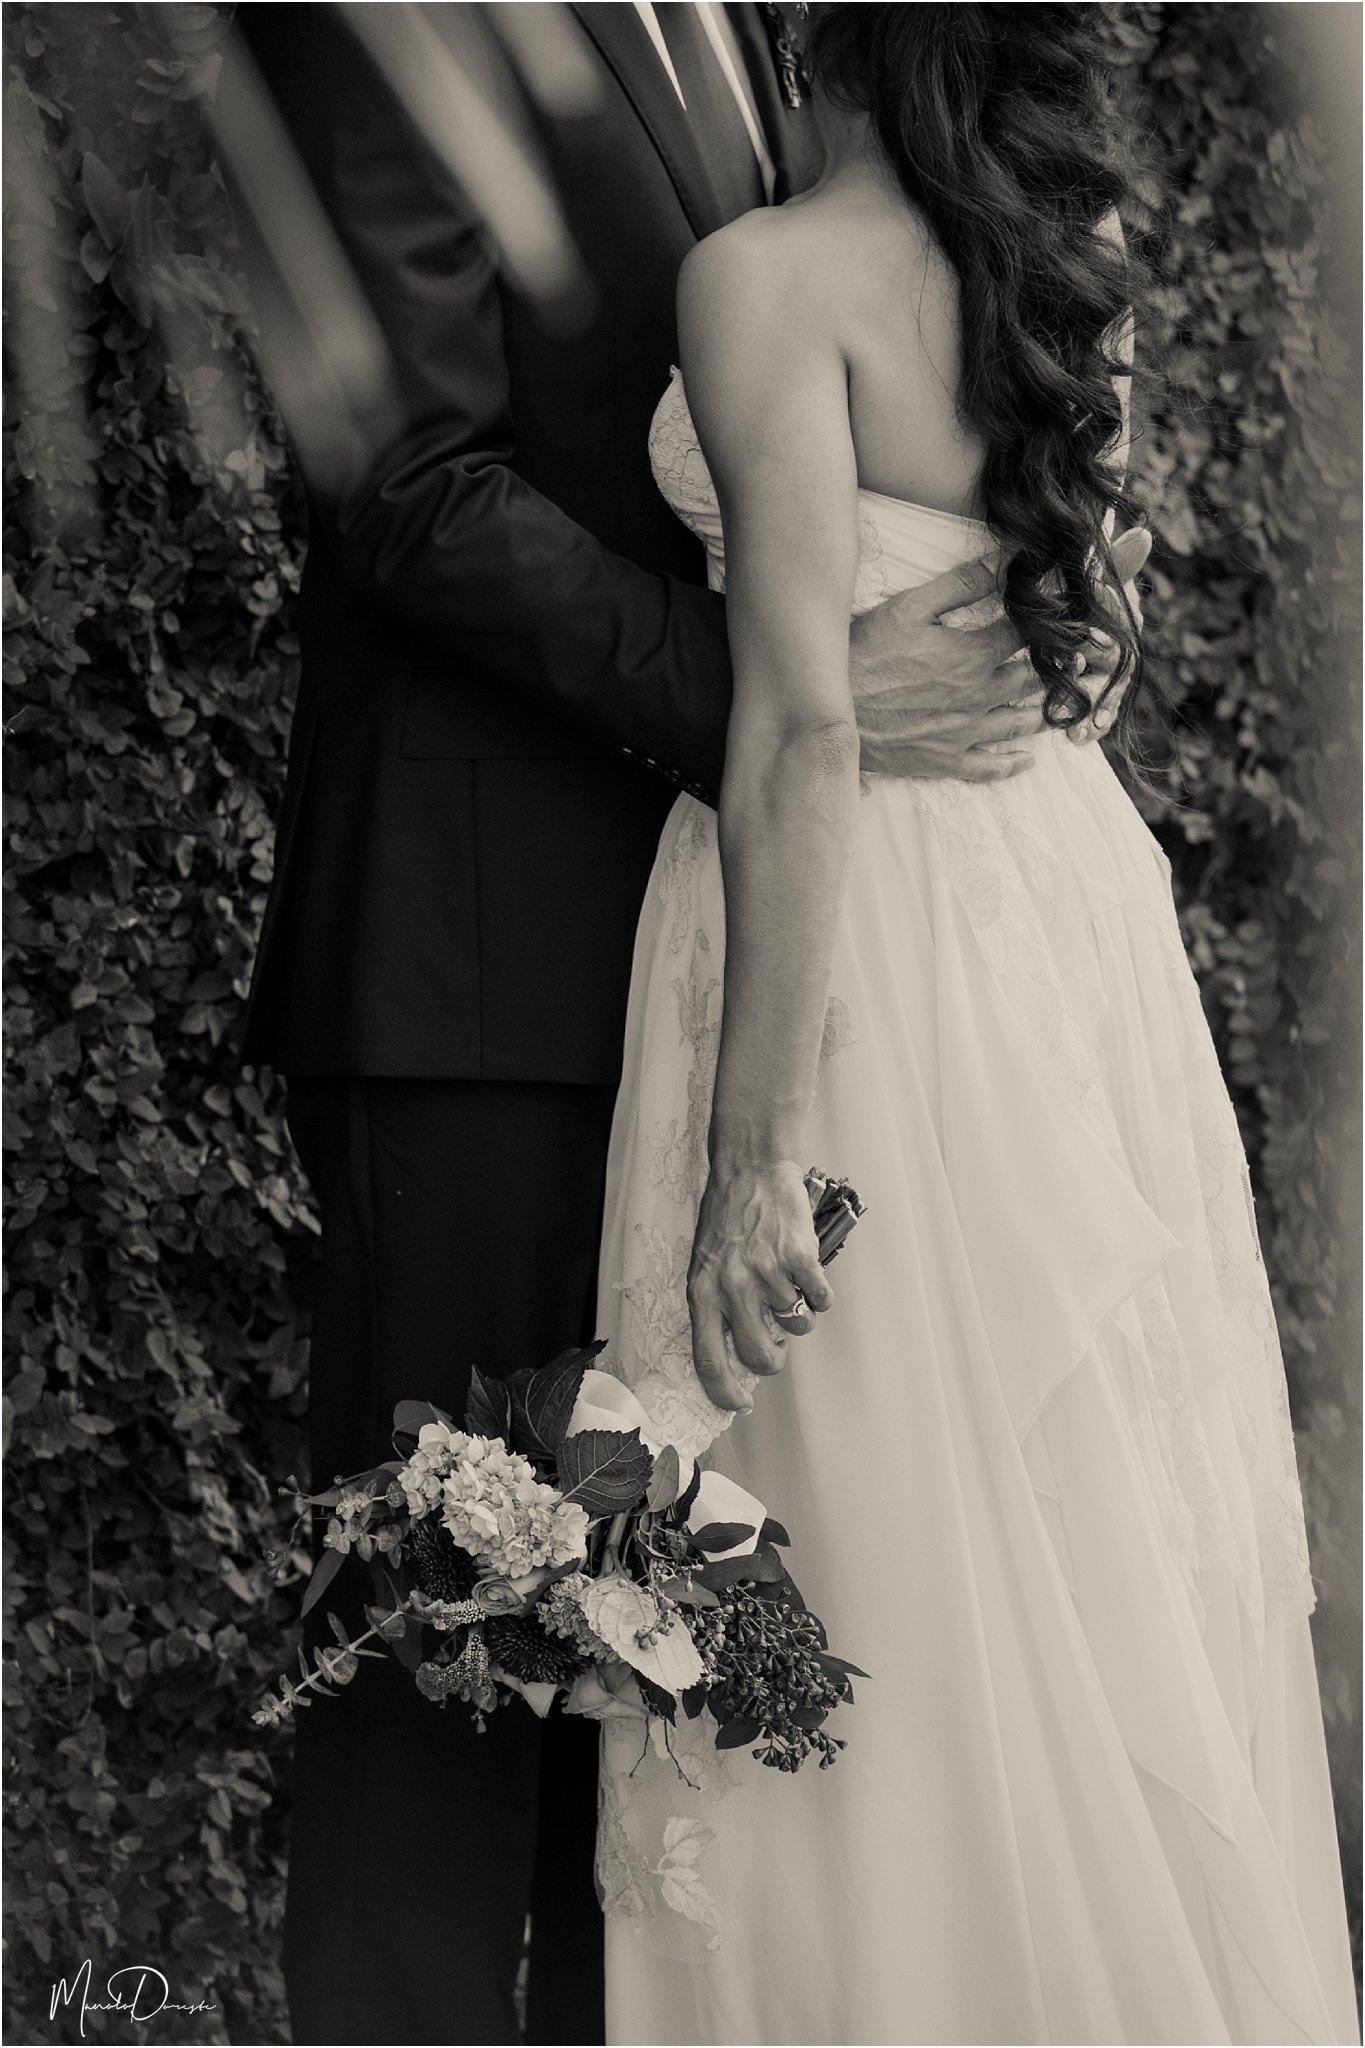 0514_ManoloDoreste_InFocusStudios_Wedding_Family_Photography_Miami_MiamiPhotographer.jpg